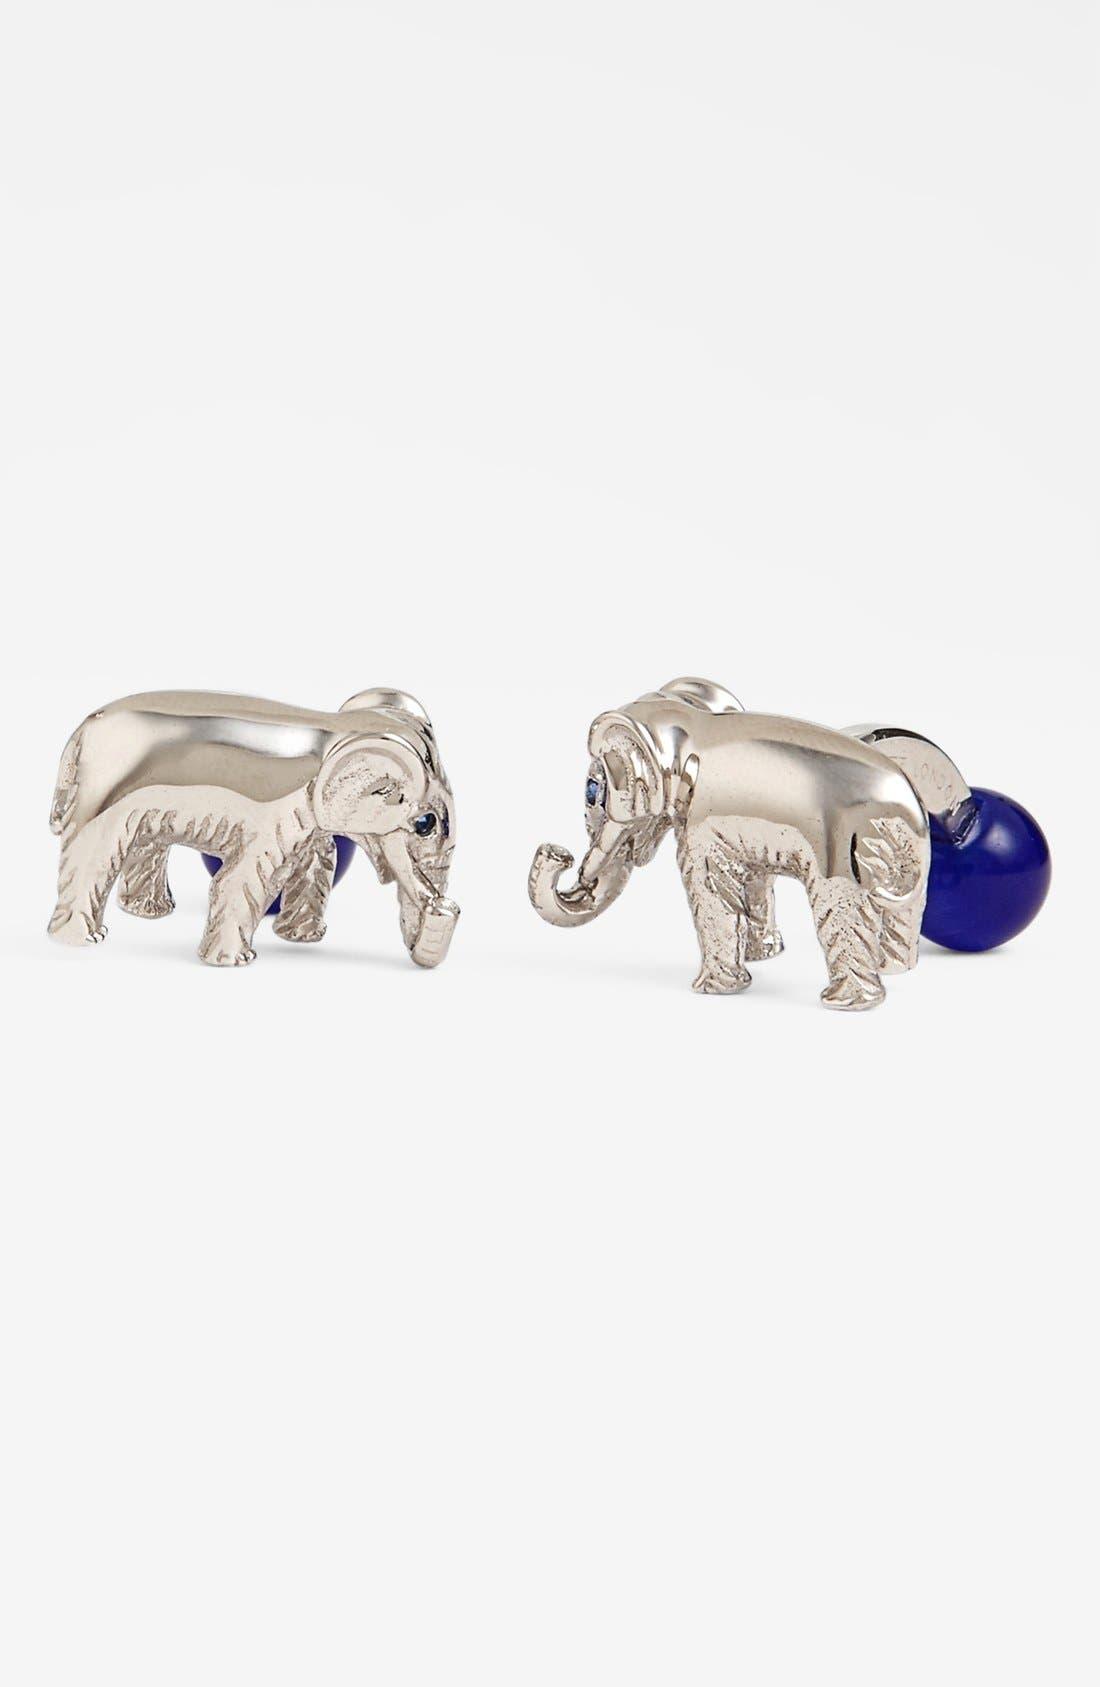 Alternate Image 1 Selected - Tateossian 'Elephant' Cuff Links